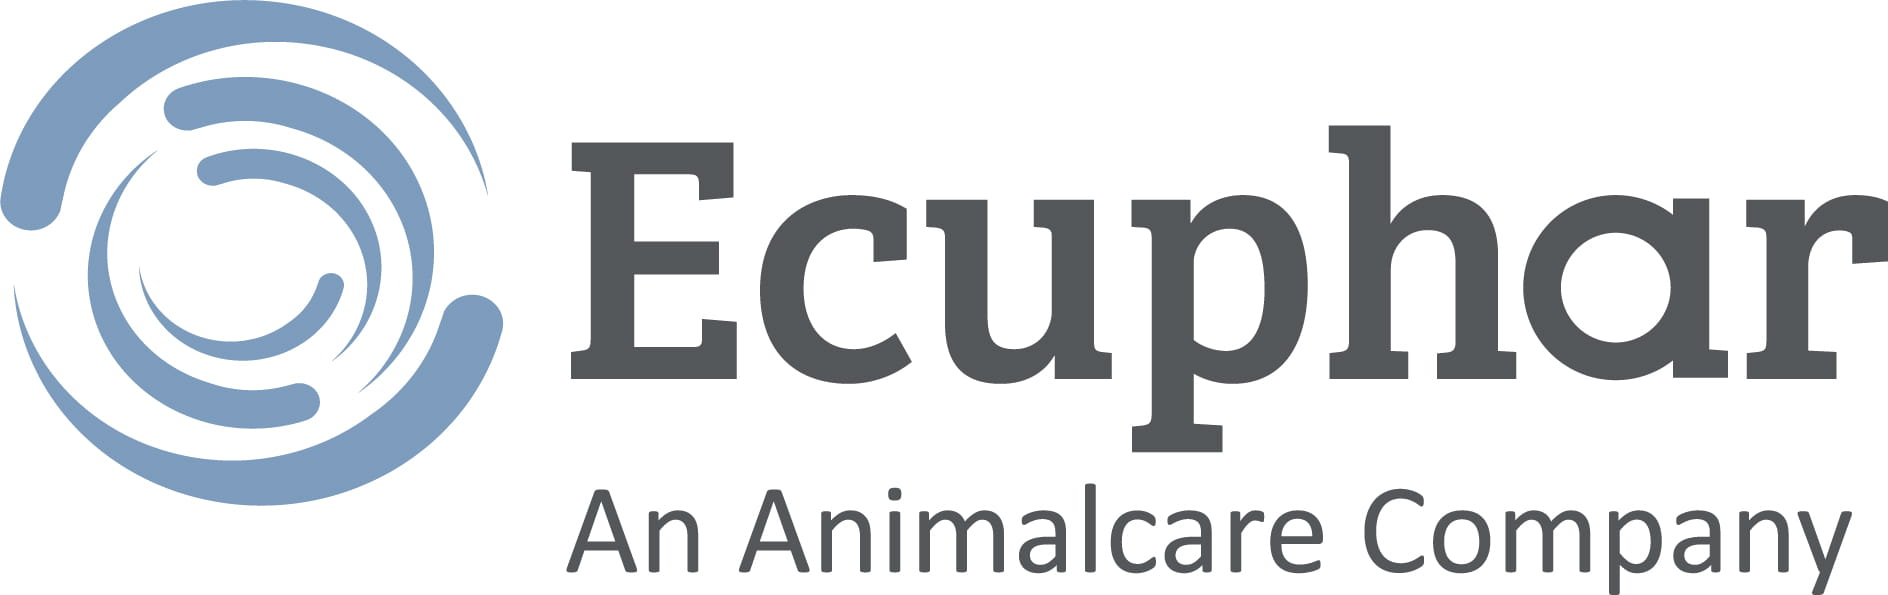 Ecuphar GmbH